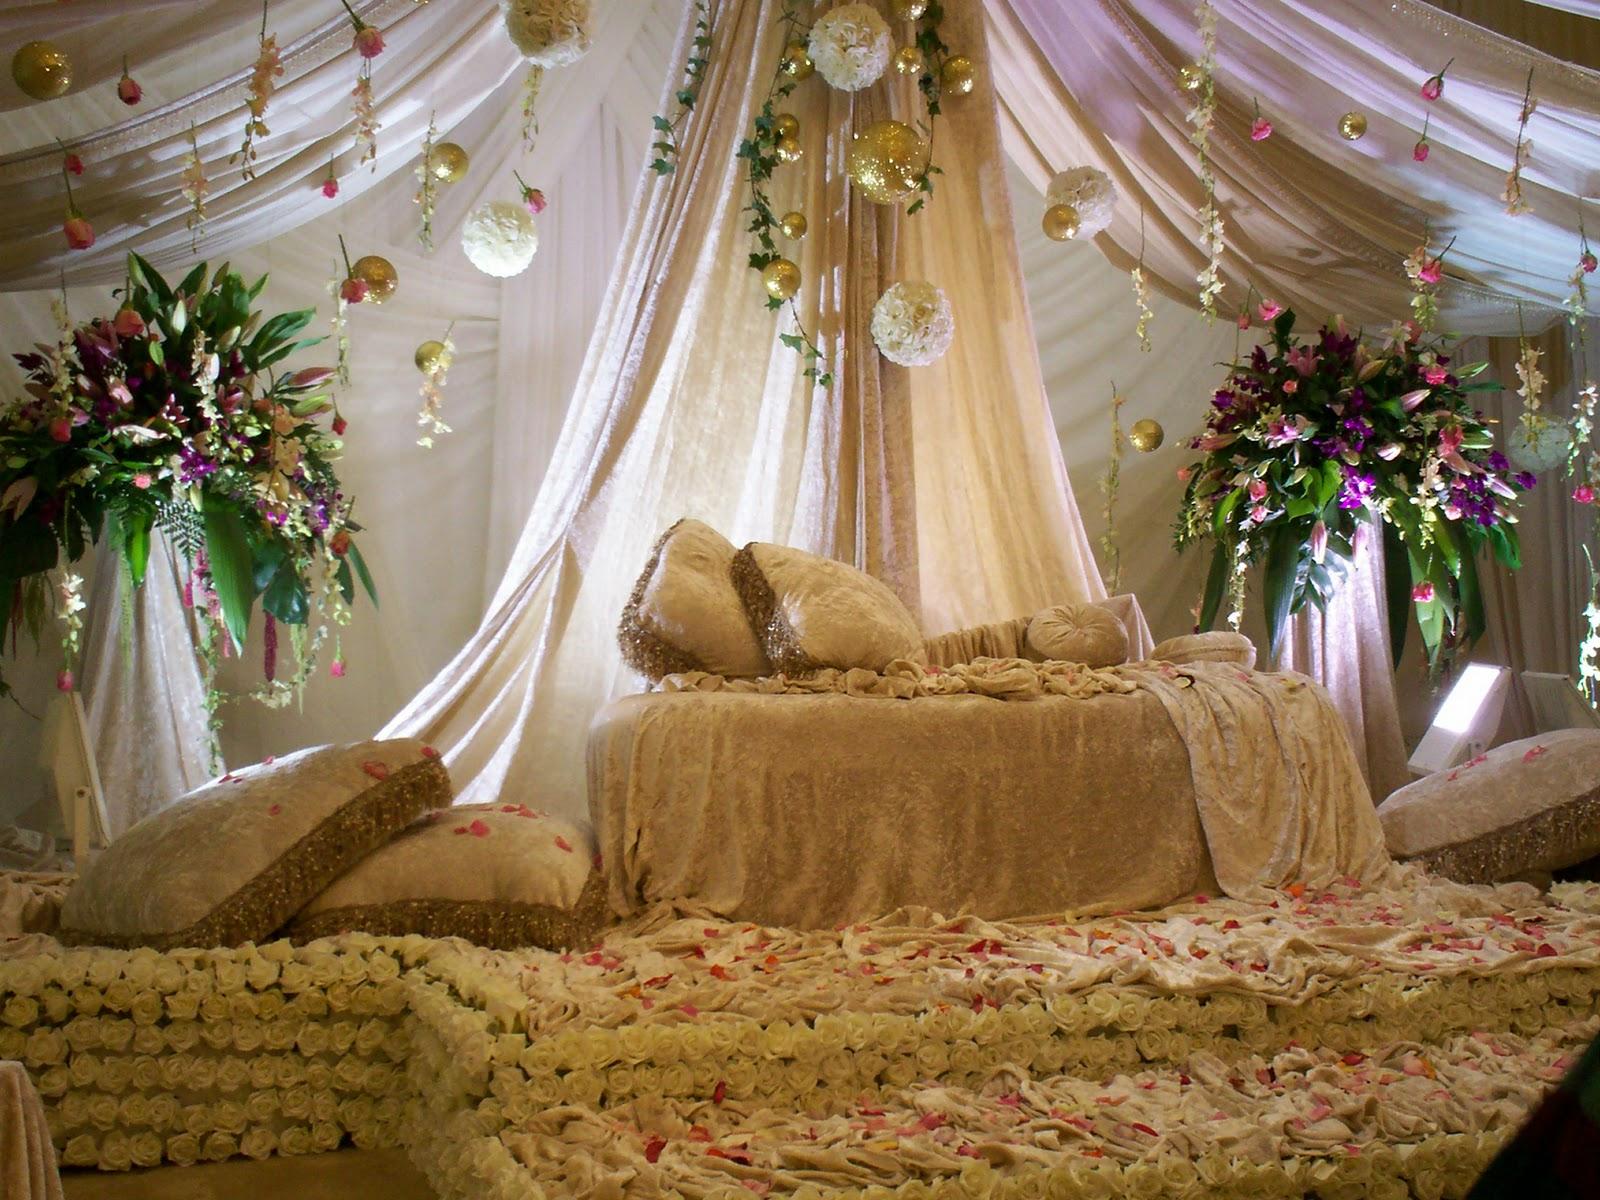 Country Backyard Wedding Ideas gorgeous rustic outdoor wedding reception small backyard wedding reception ideas amys office Arabic Weddings Arabic Wedding Dresses